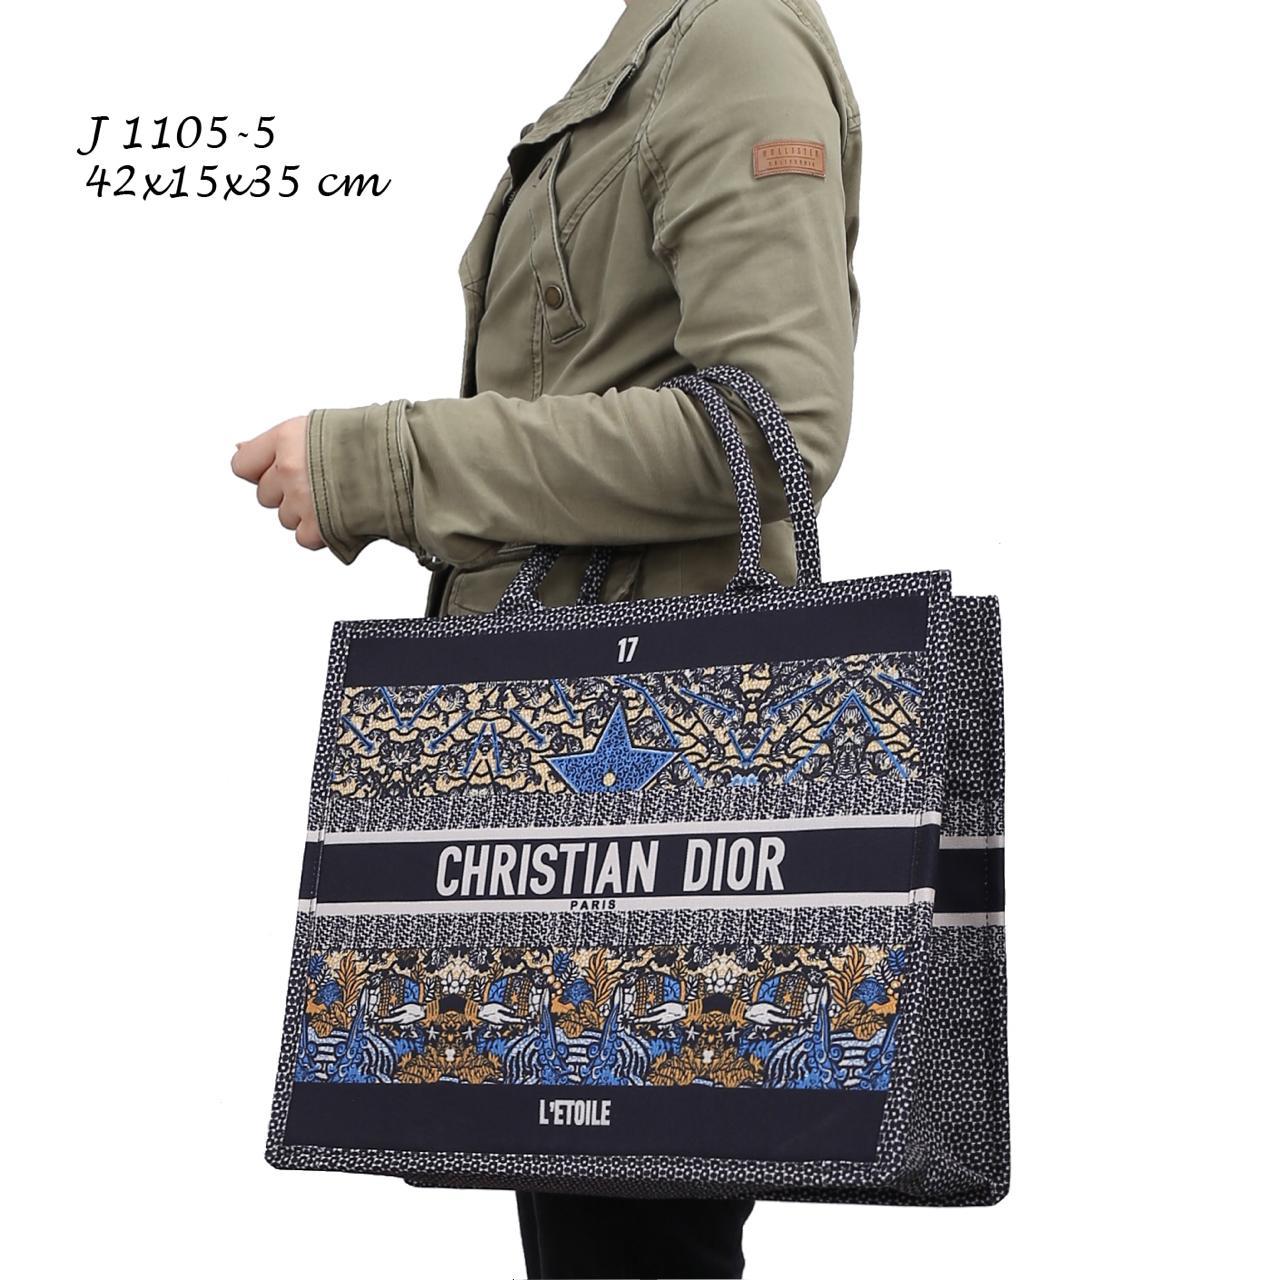 tas christian dior semi premium 2020 1105-5JZ,tas dior original, tas dior mini, tas dior asli, tas dior lady